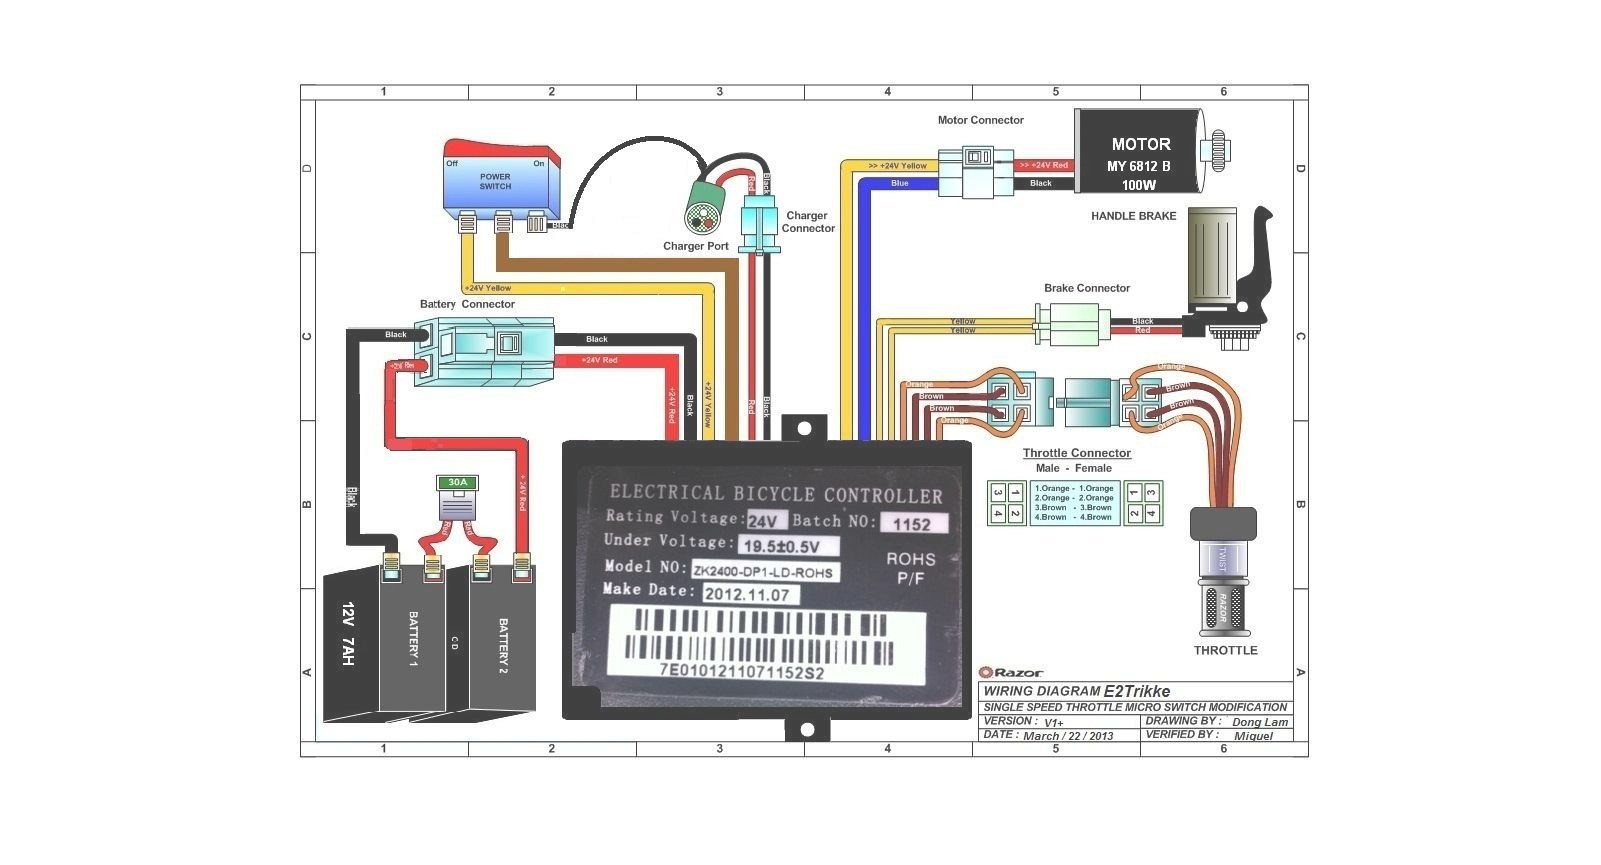 Razor Scooter E300 Wiring Diagram - 4k Wiki Wallpapers 2018